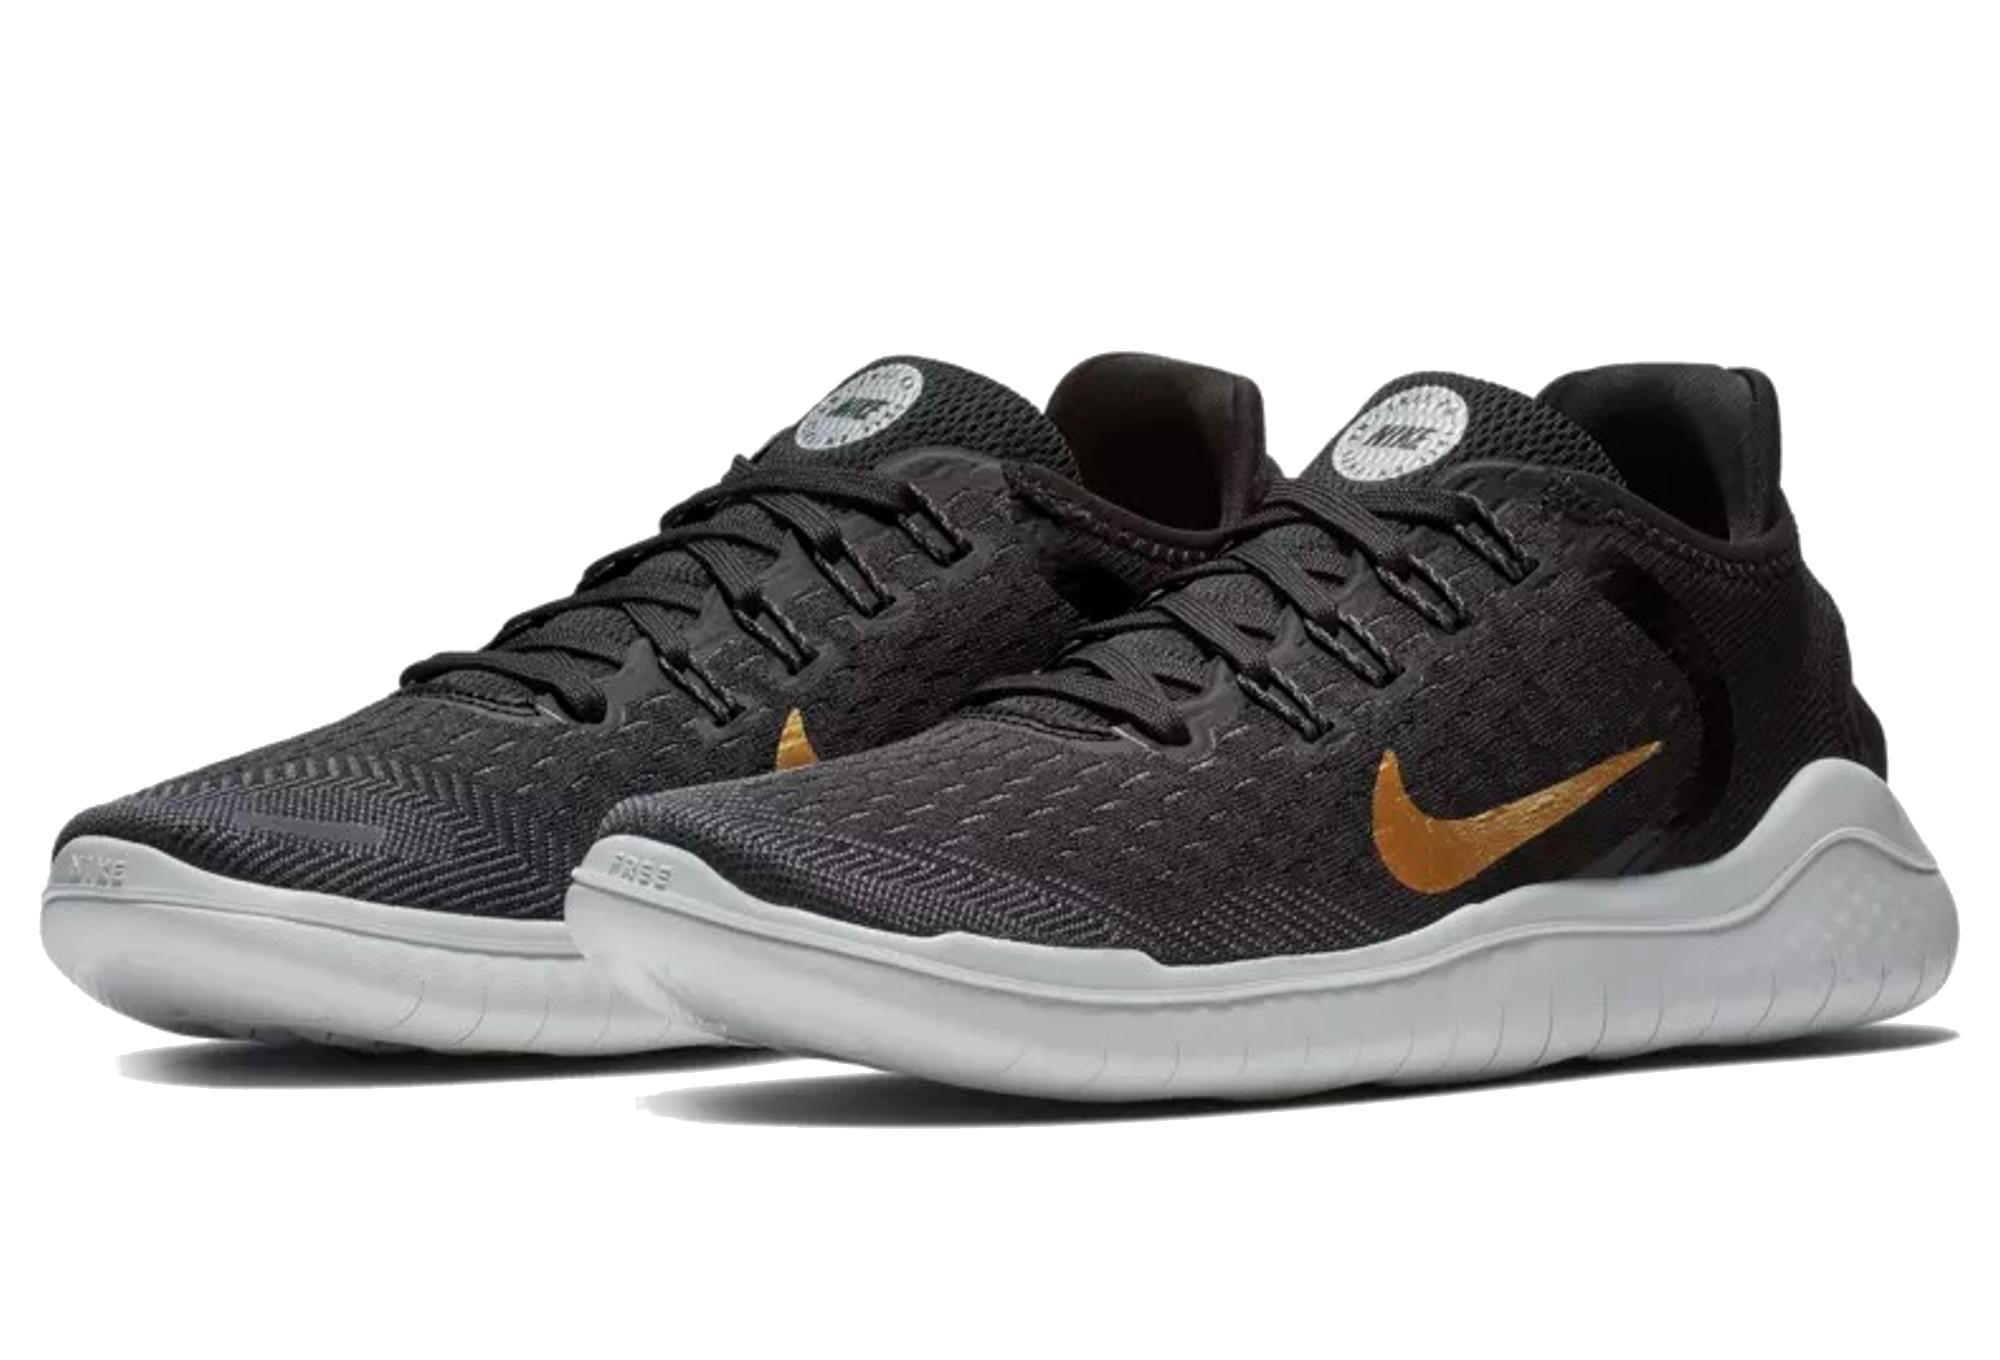 Nike Free RN 2018 Women's Shoes Black Gold | Alltricks.com